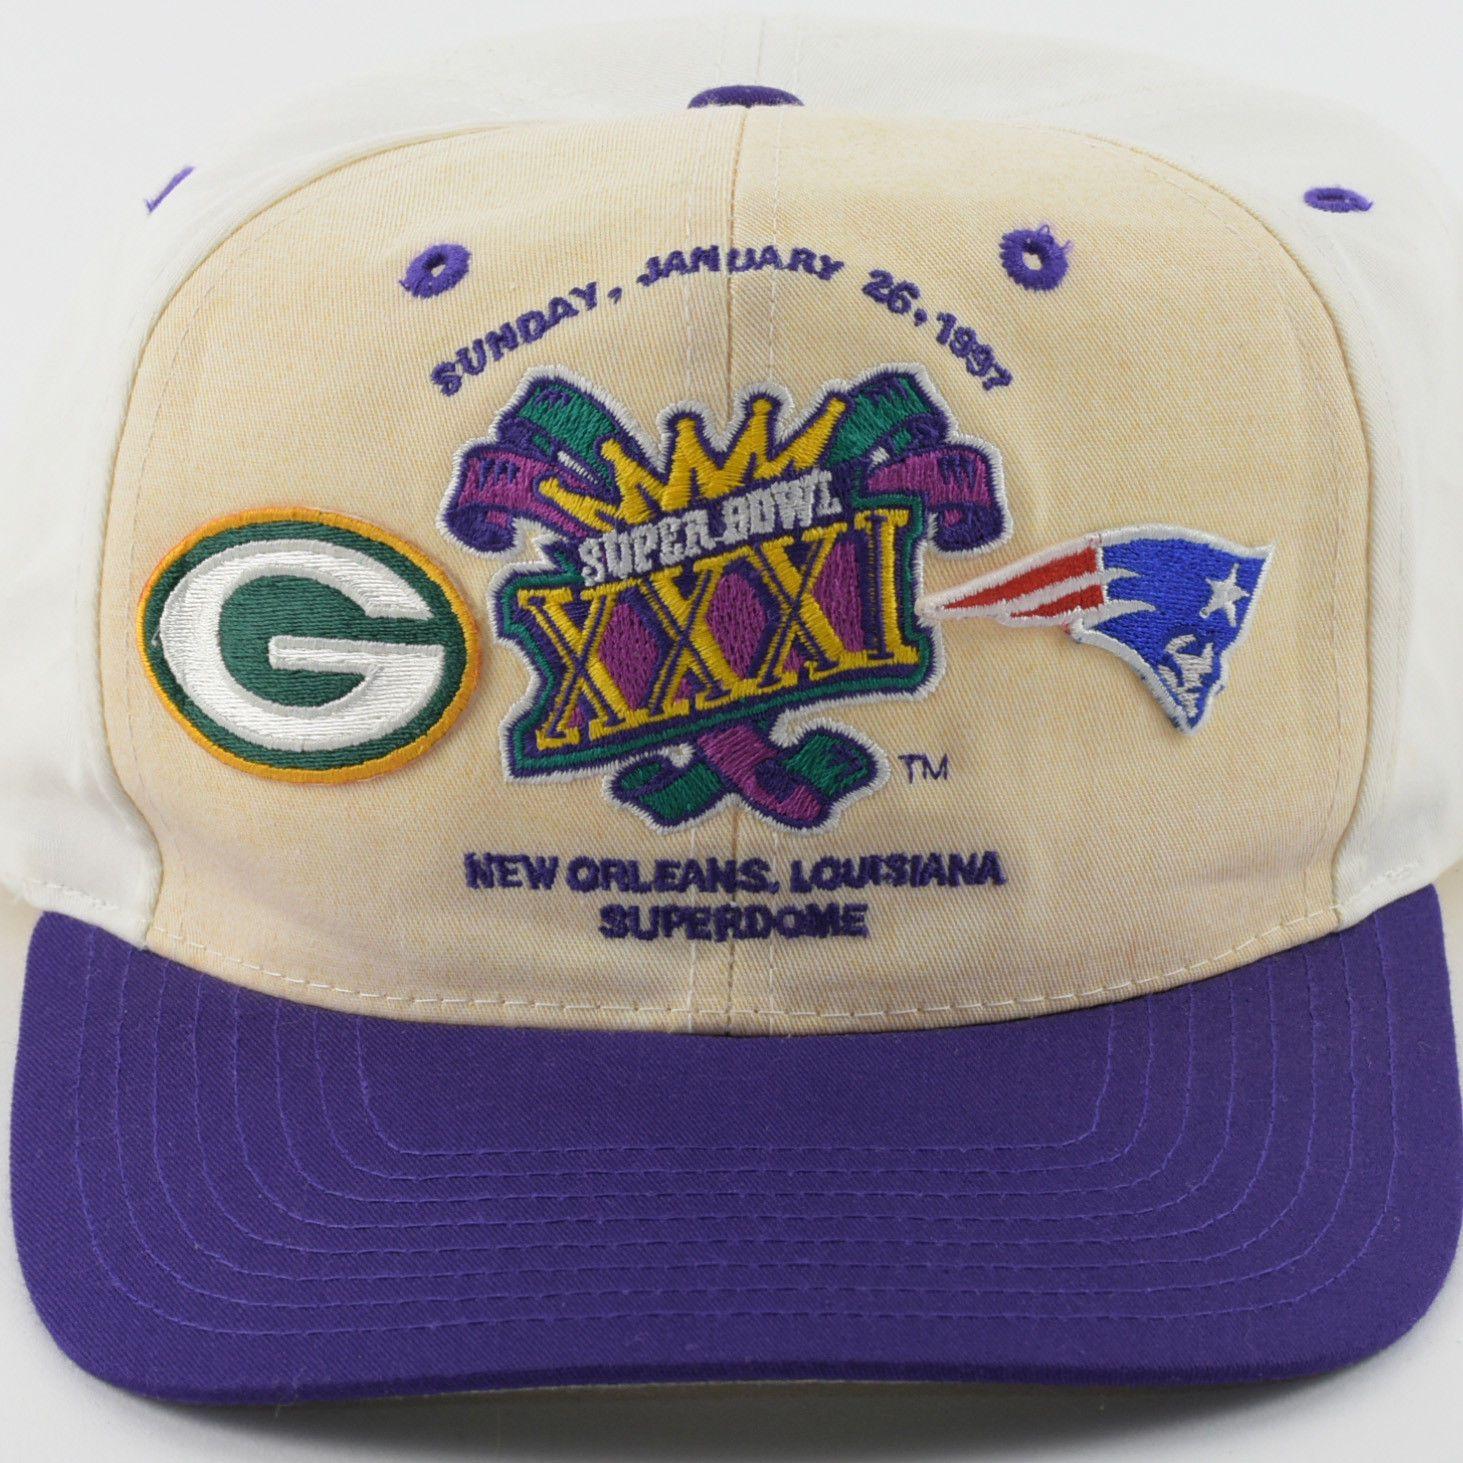 Vintage 1997 Super Bowl Xxxi New England Patriots Green Bay Packers Twill Snapback Hat Snapback Hats Patriots New England Patriots